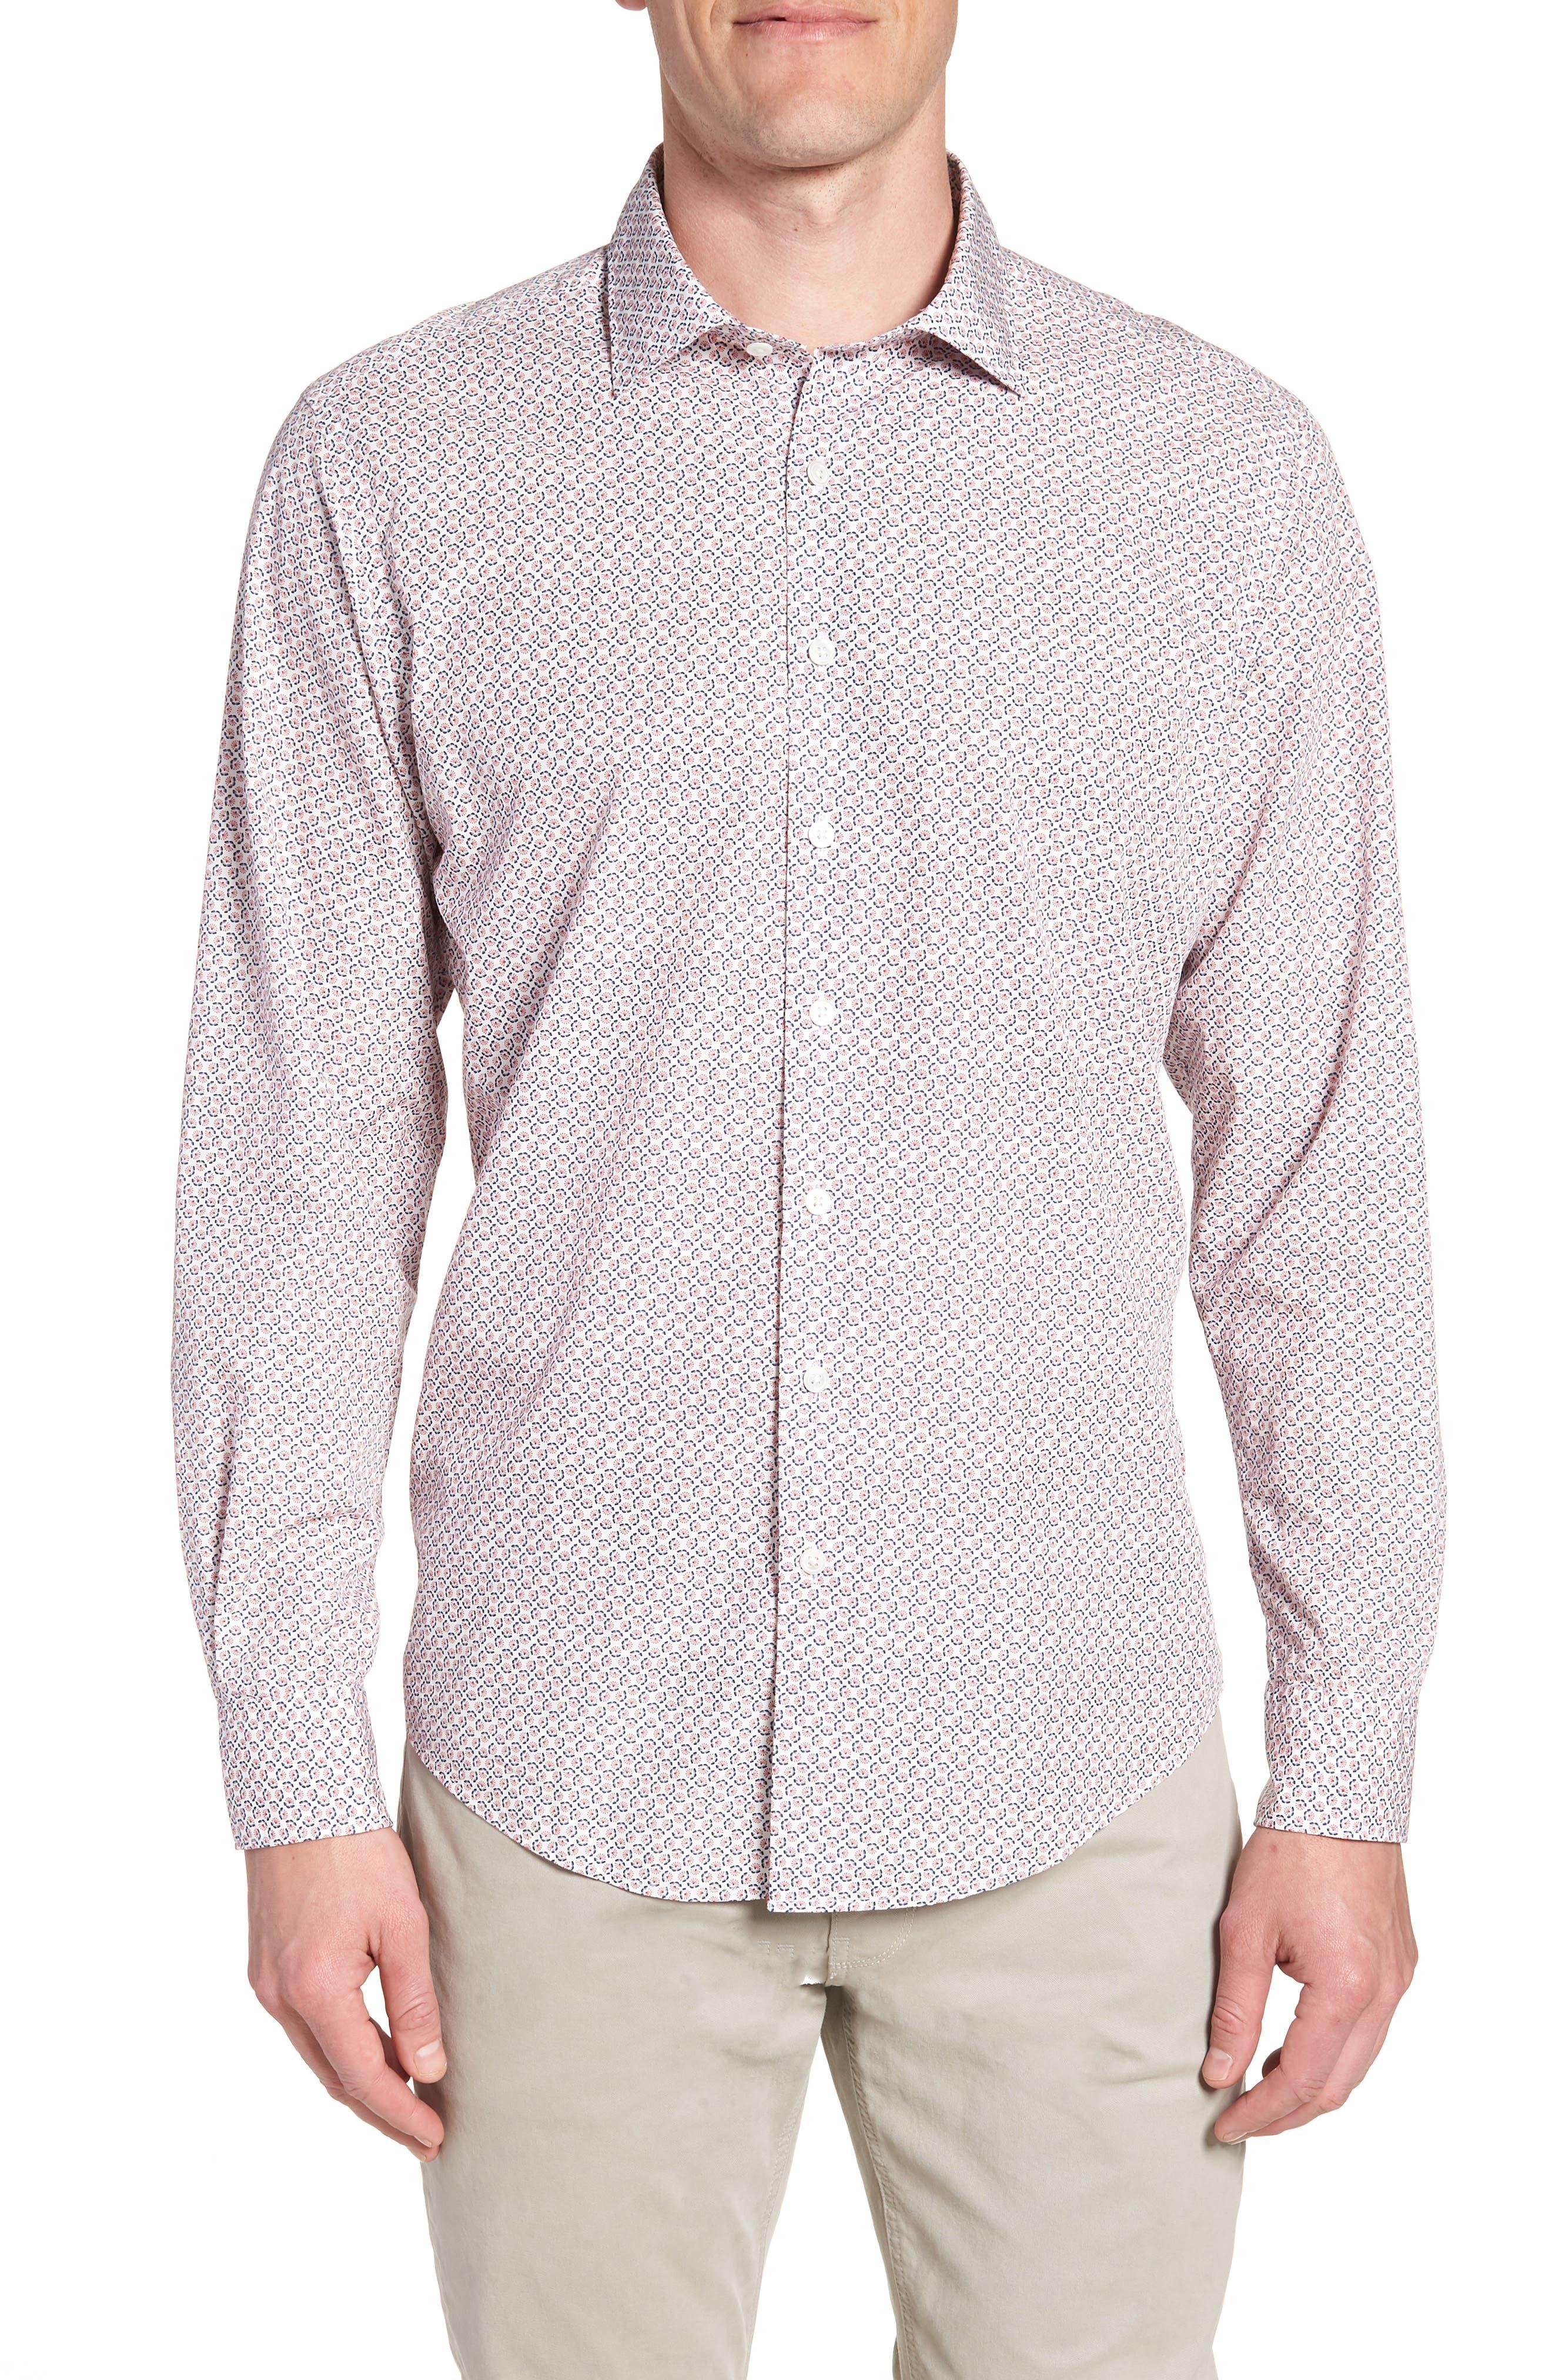 Market Cross Sport Shirt,                             Main thumbnail 1, color,                             640